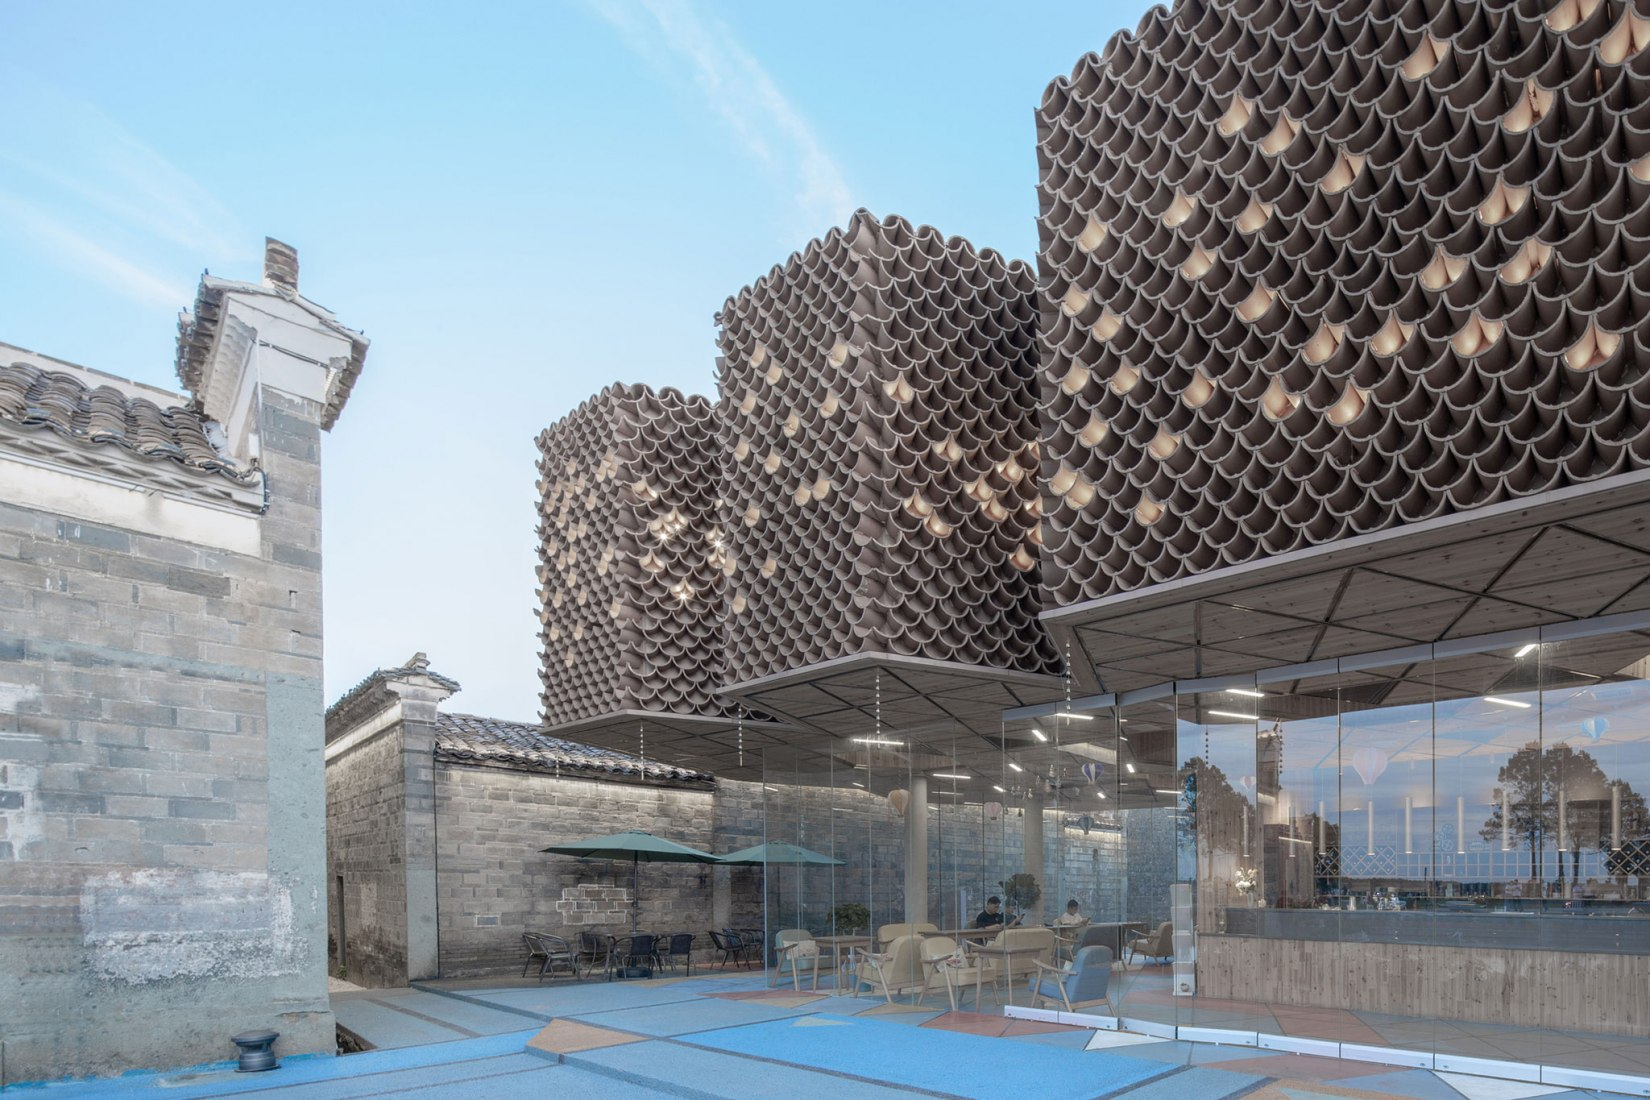 Holland Dafang Creative Village por NEXT architects. Imagen cortesía de NEXT architects